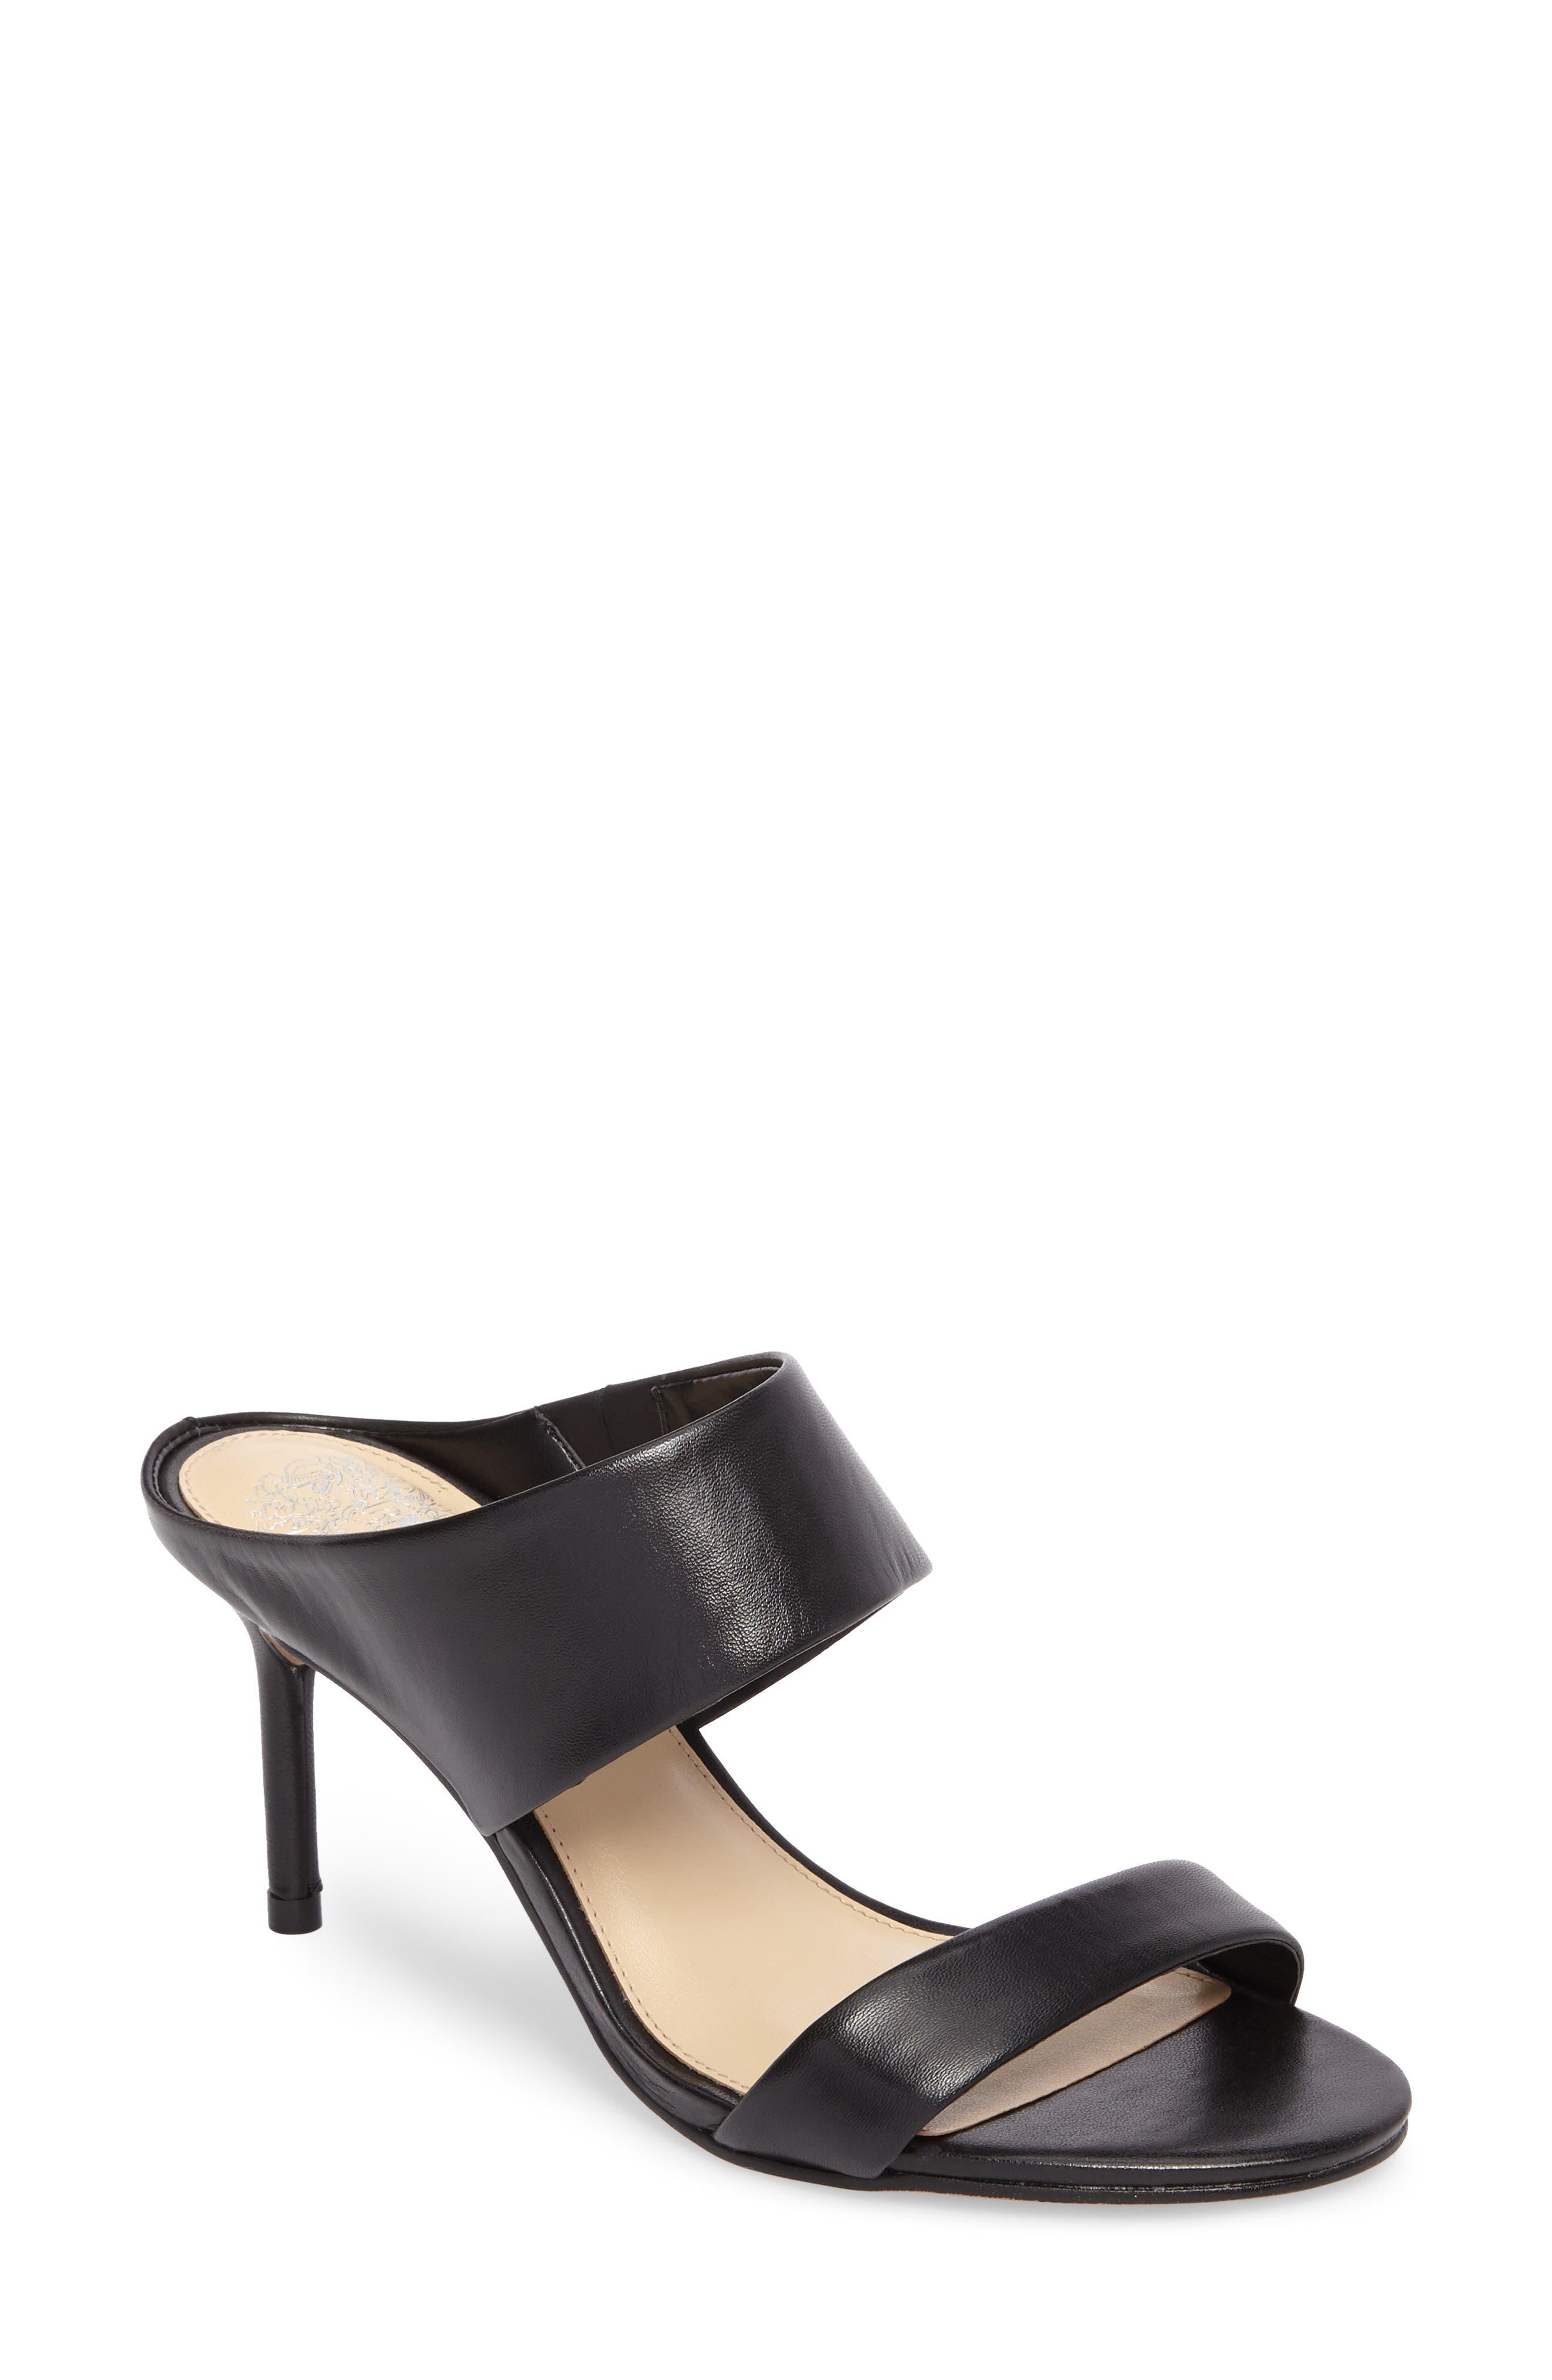 Navinta Sandal,                         Main,                         color, Black Nappa Leather